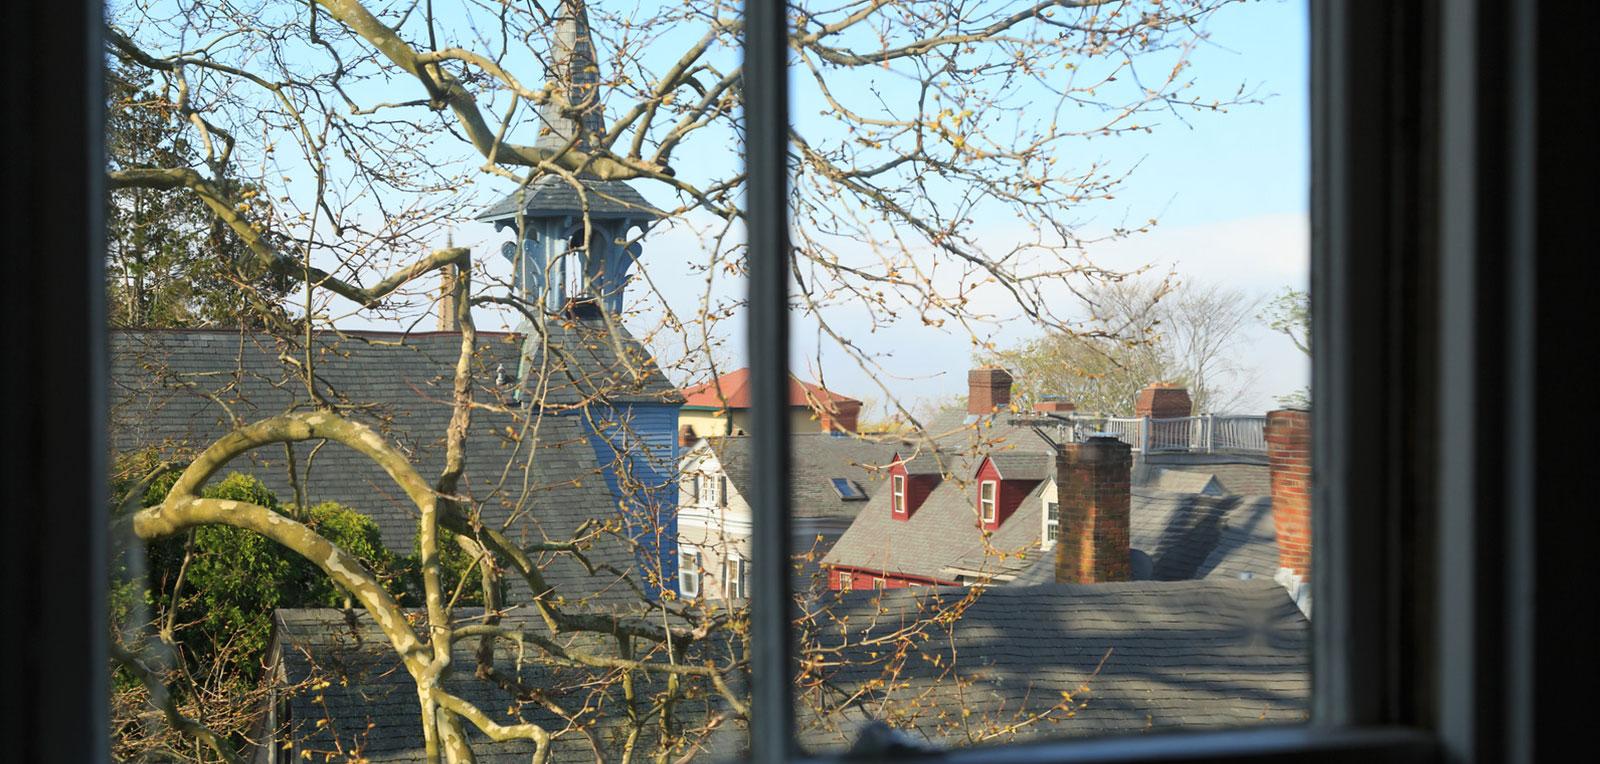 2BR Apartment Window View | ADMIRAL SIMS B&B, Newport Rhode Island